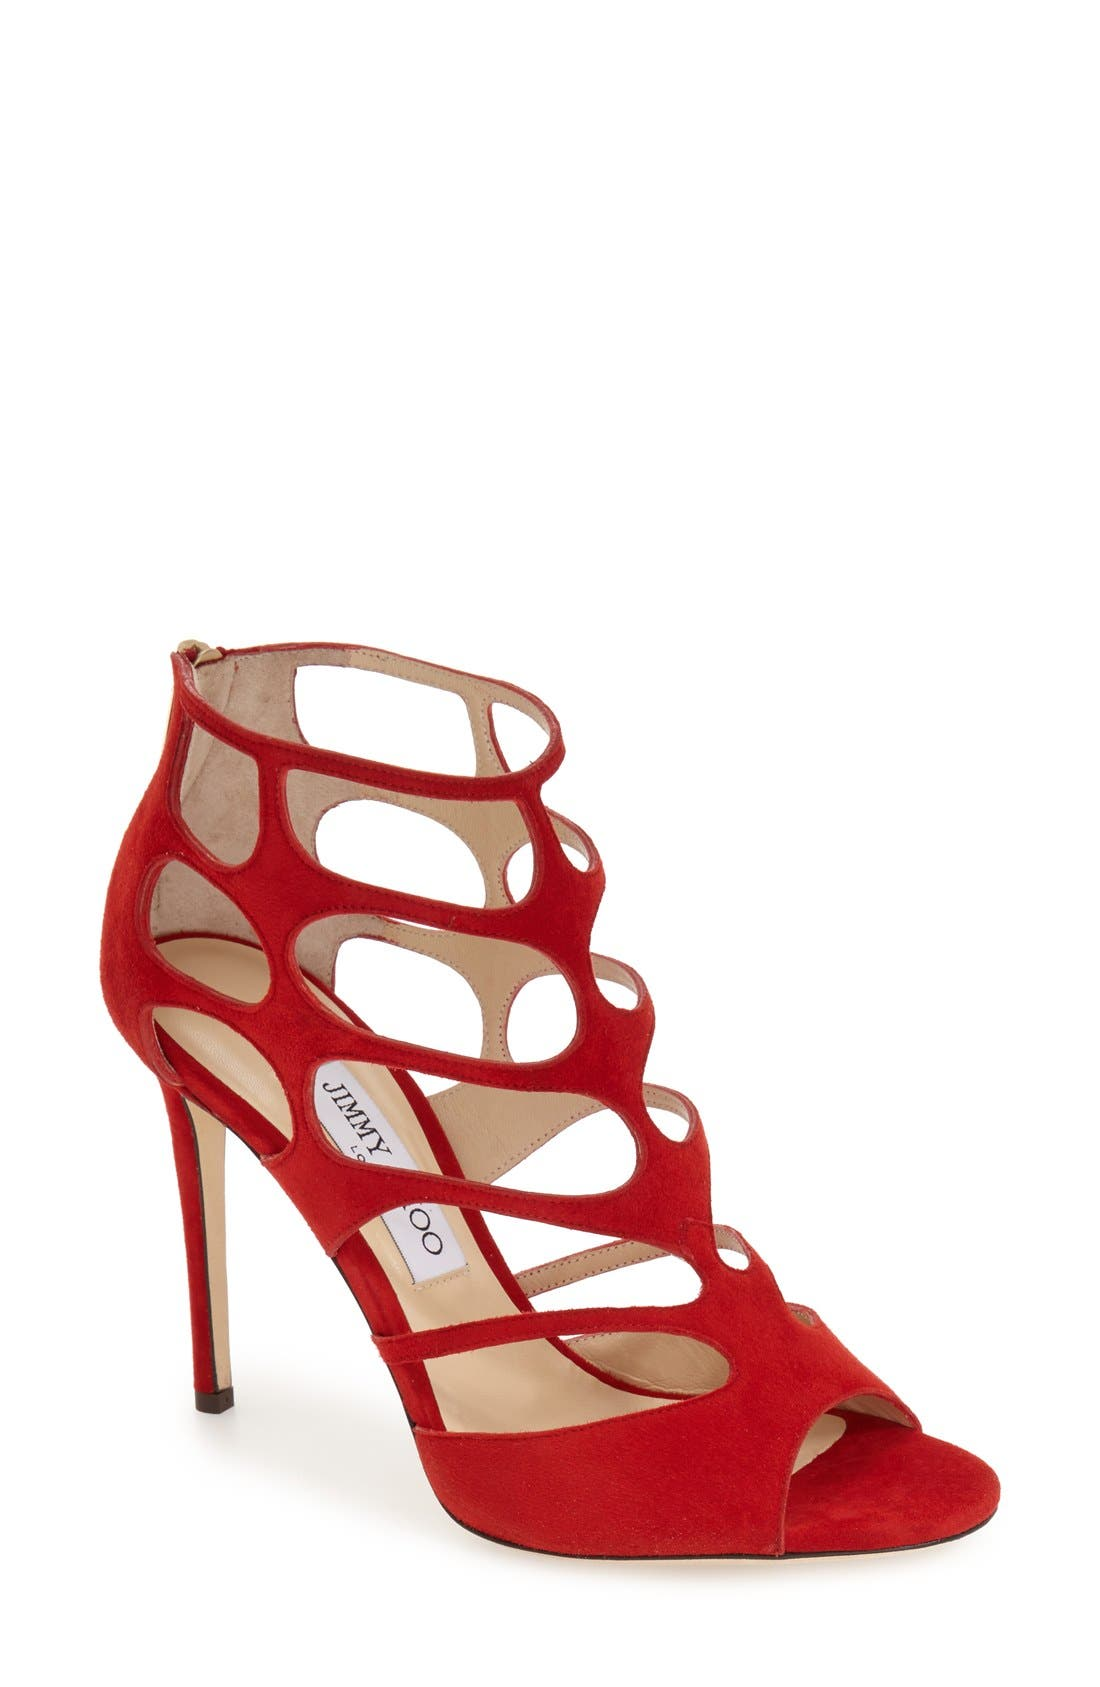 Alternate Image 1 Selected - Jimmy Choo 'Ren' Cutout Sandal (Women)